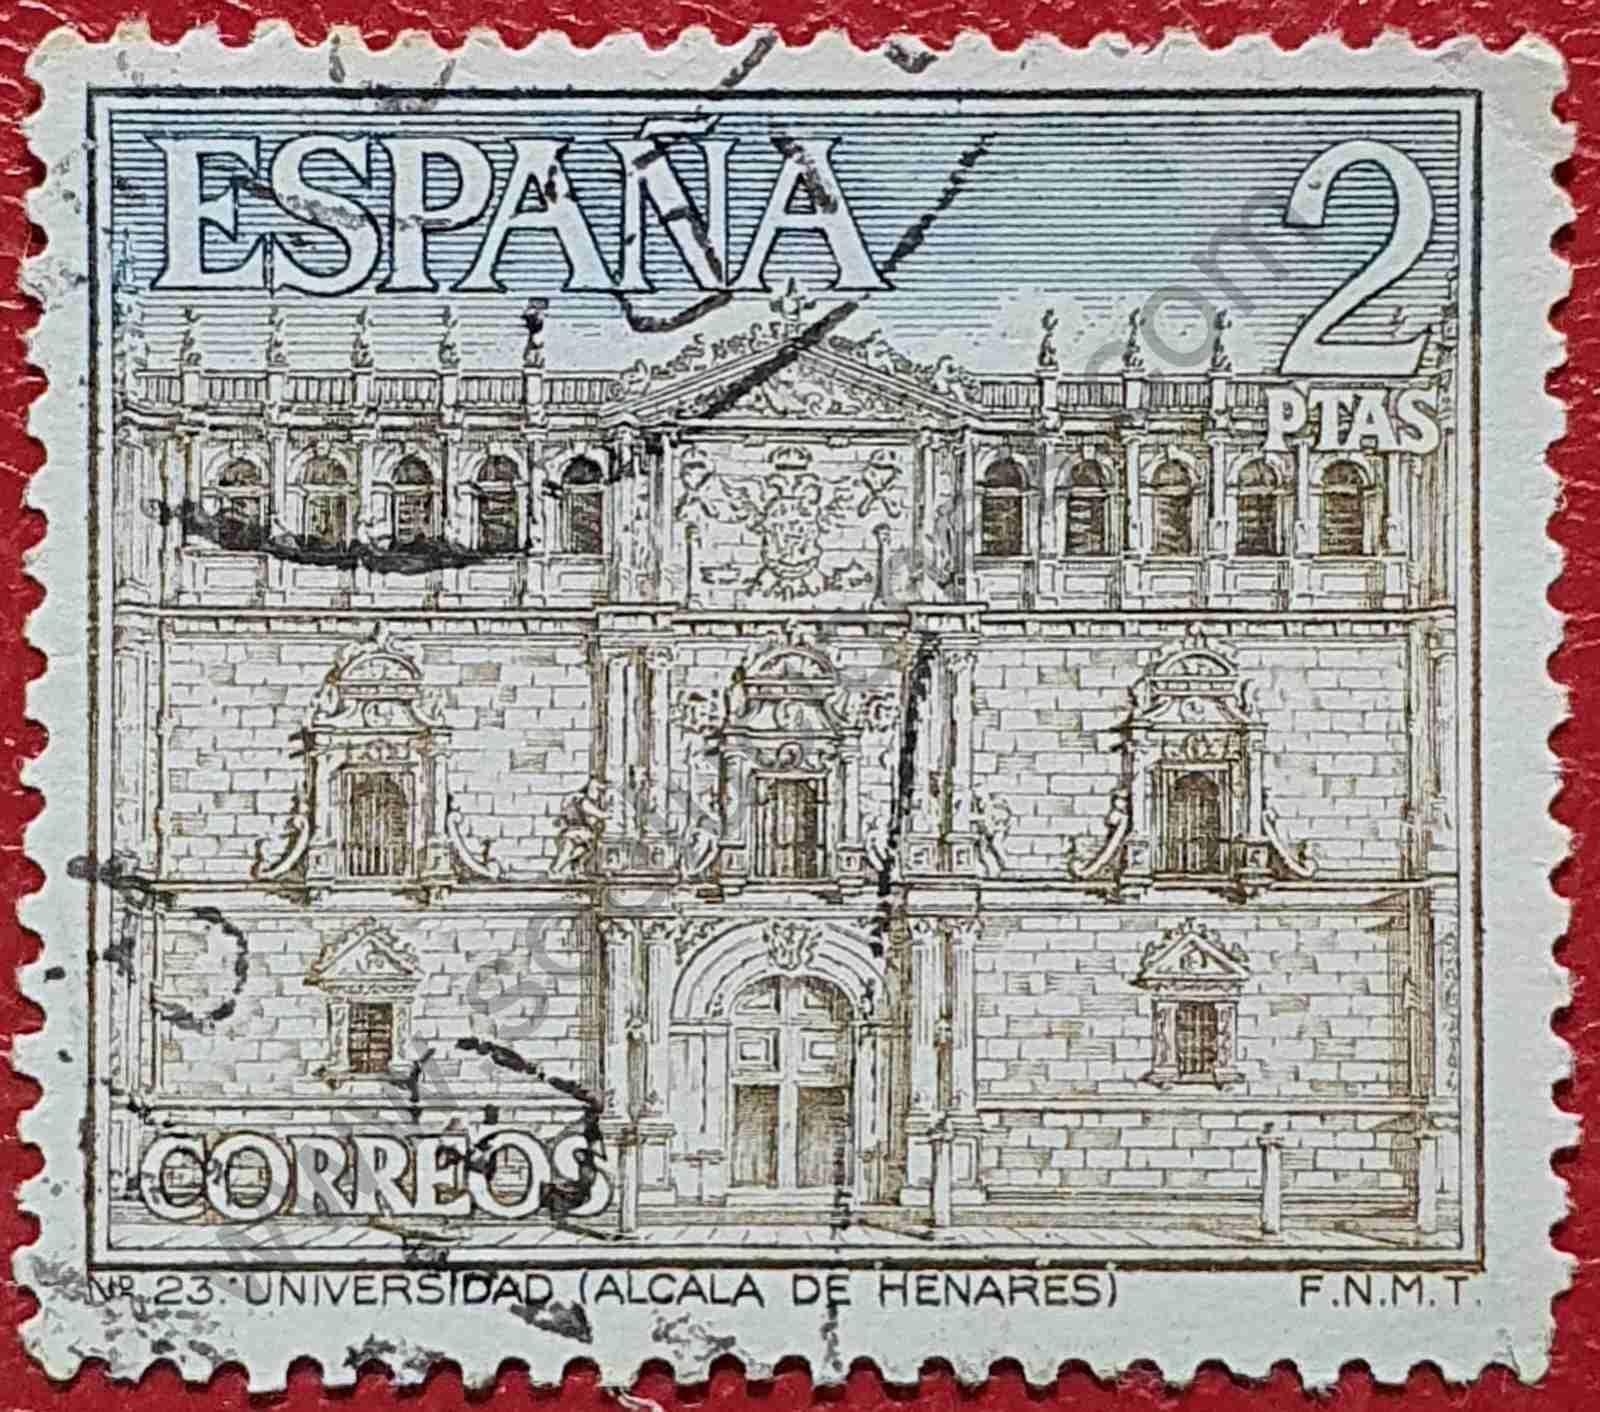 Sello Universidad de Alcalá de Henares - España 1966